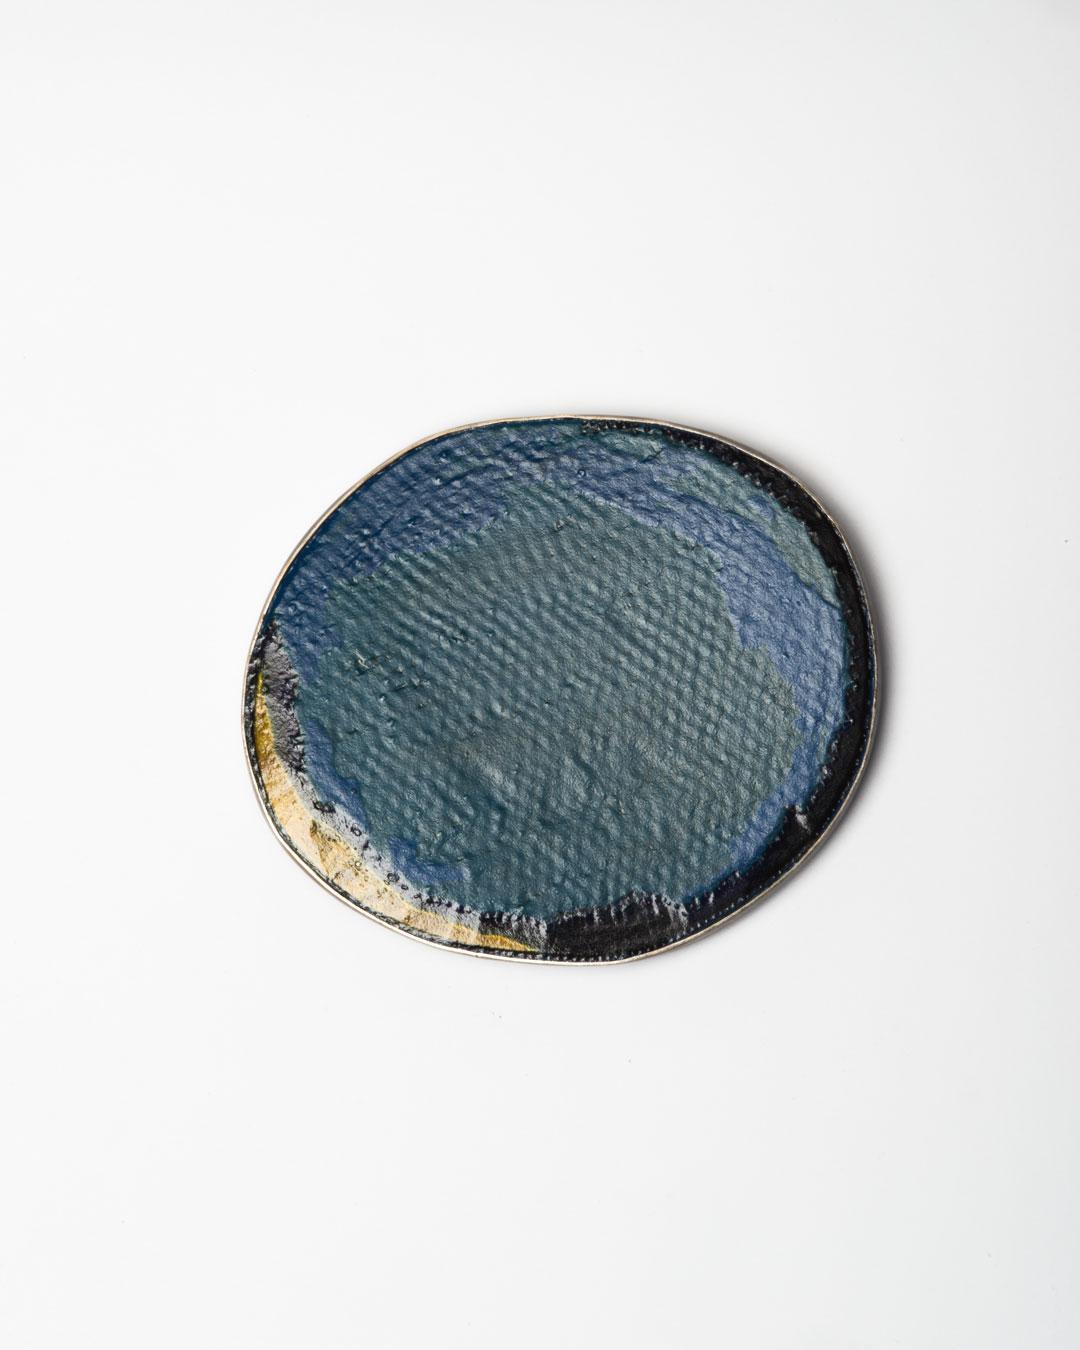 Shin Hea Lim, Drew a Rain II, 2019, brooch; mixed materials, silver, ottchil (lacquer), 100 x 81 x 10 mm, €1250